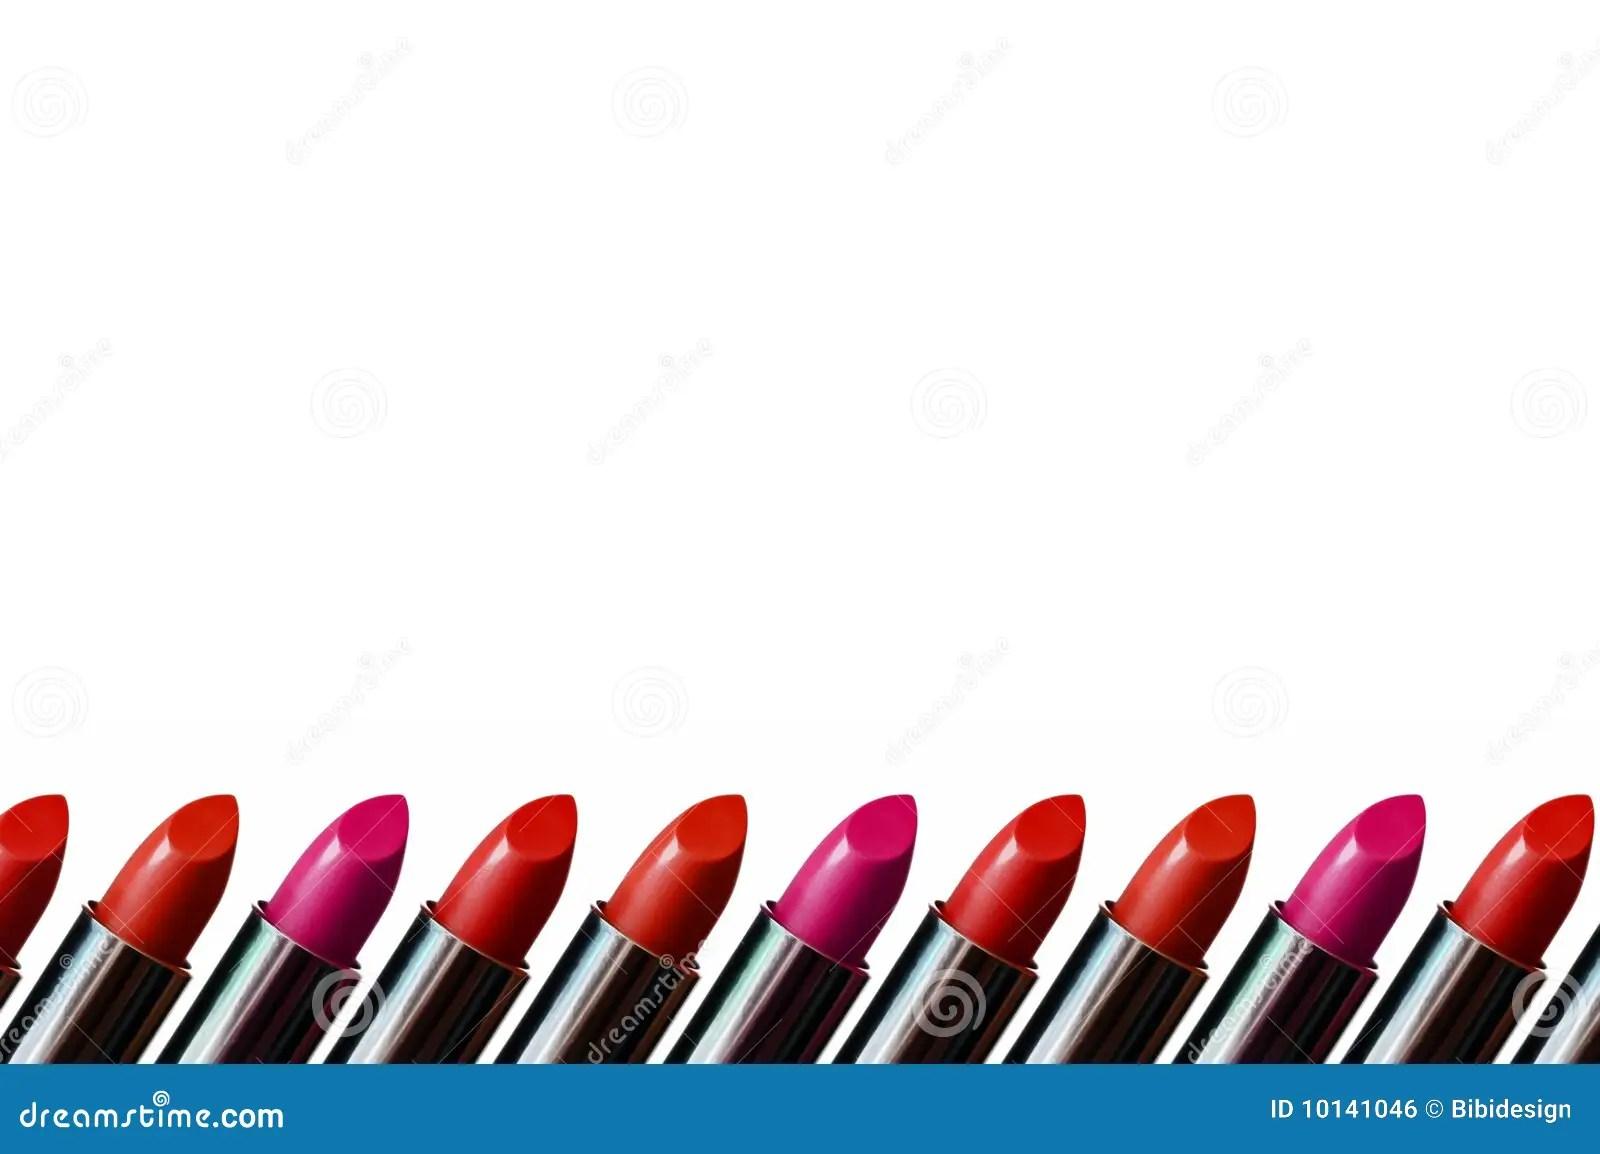 3d Money Wallpaper Lipstick Border Royalty Free Stock Image Image 10141046